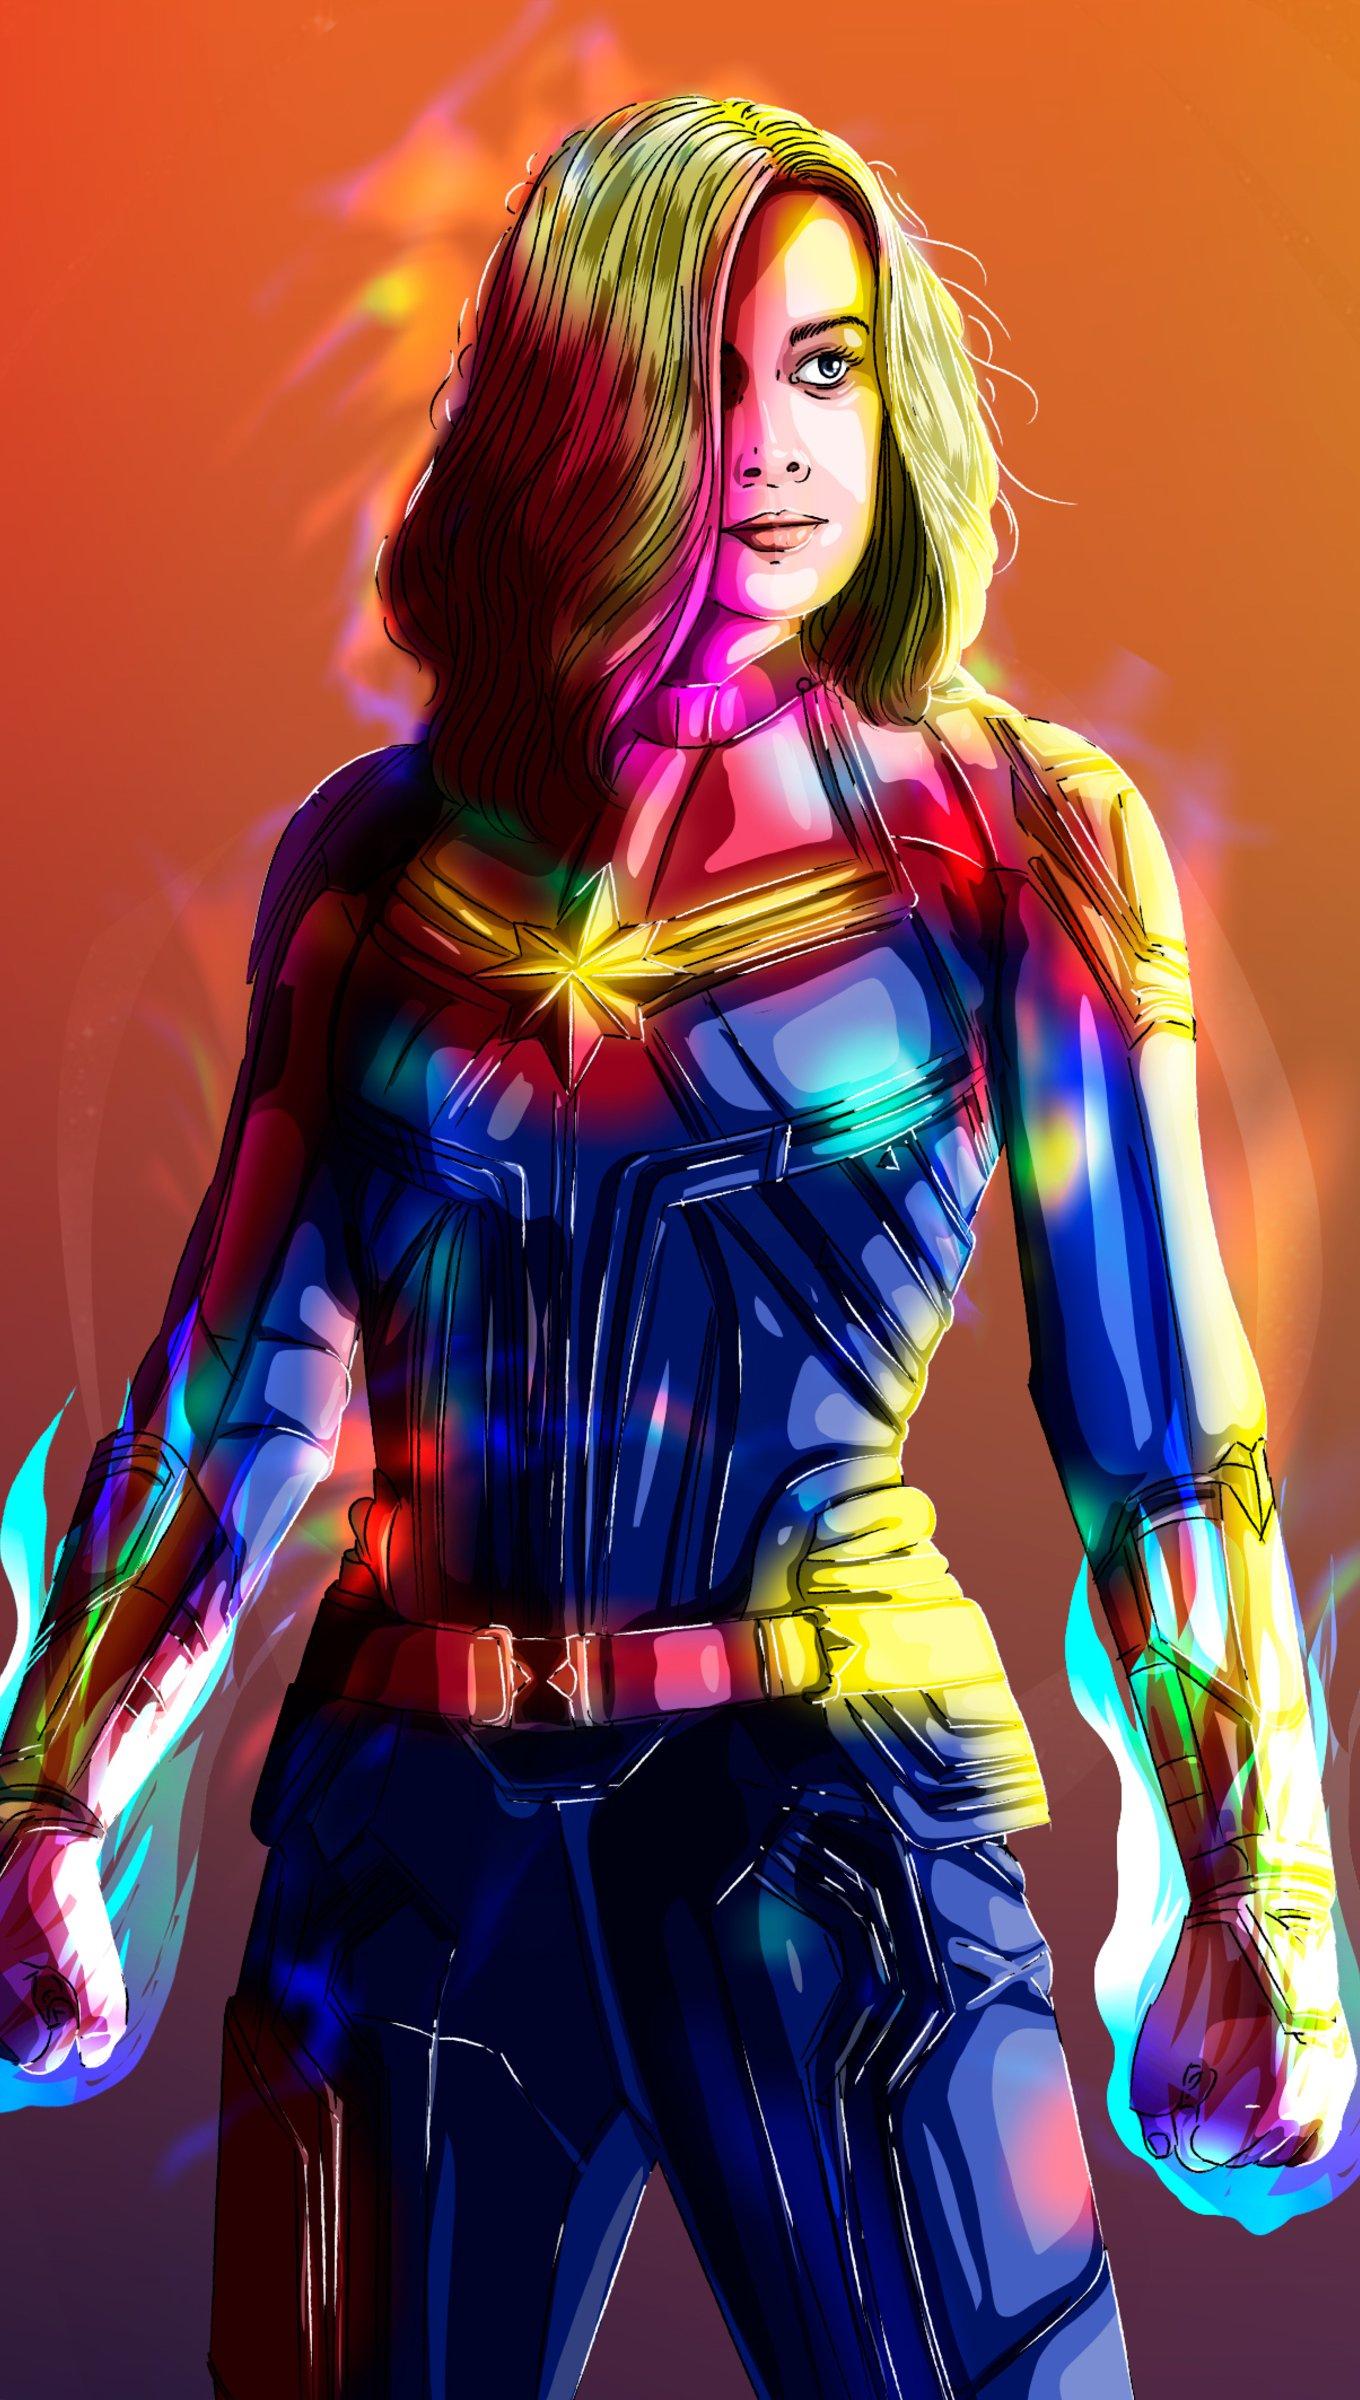 Fondos de pantalla Capitana Marvel de colores Vertical